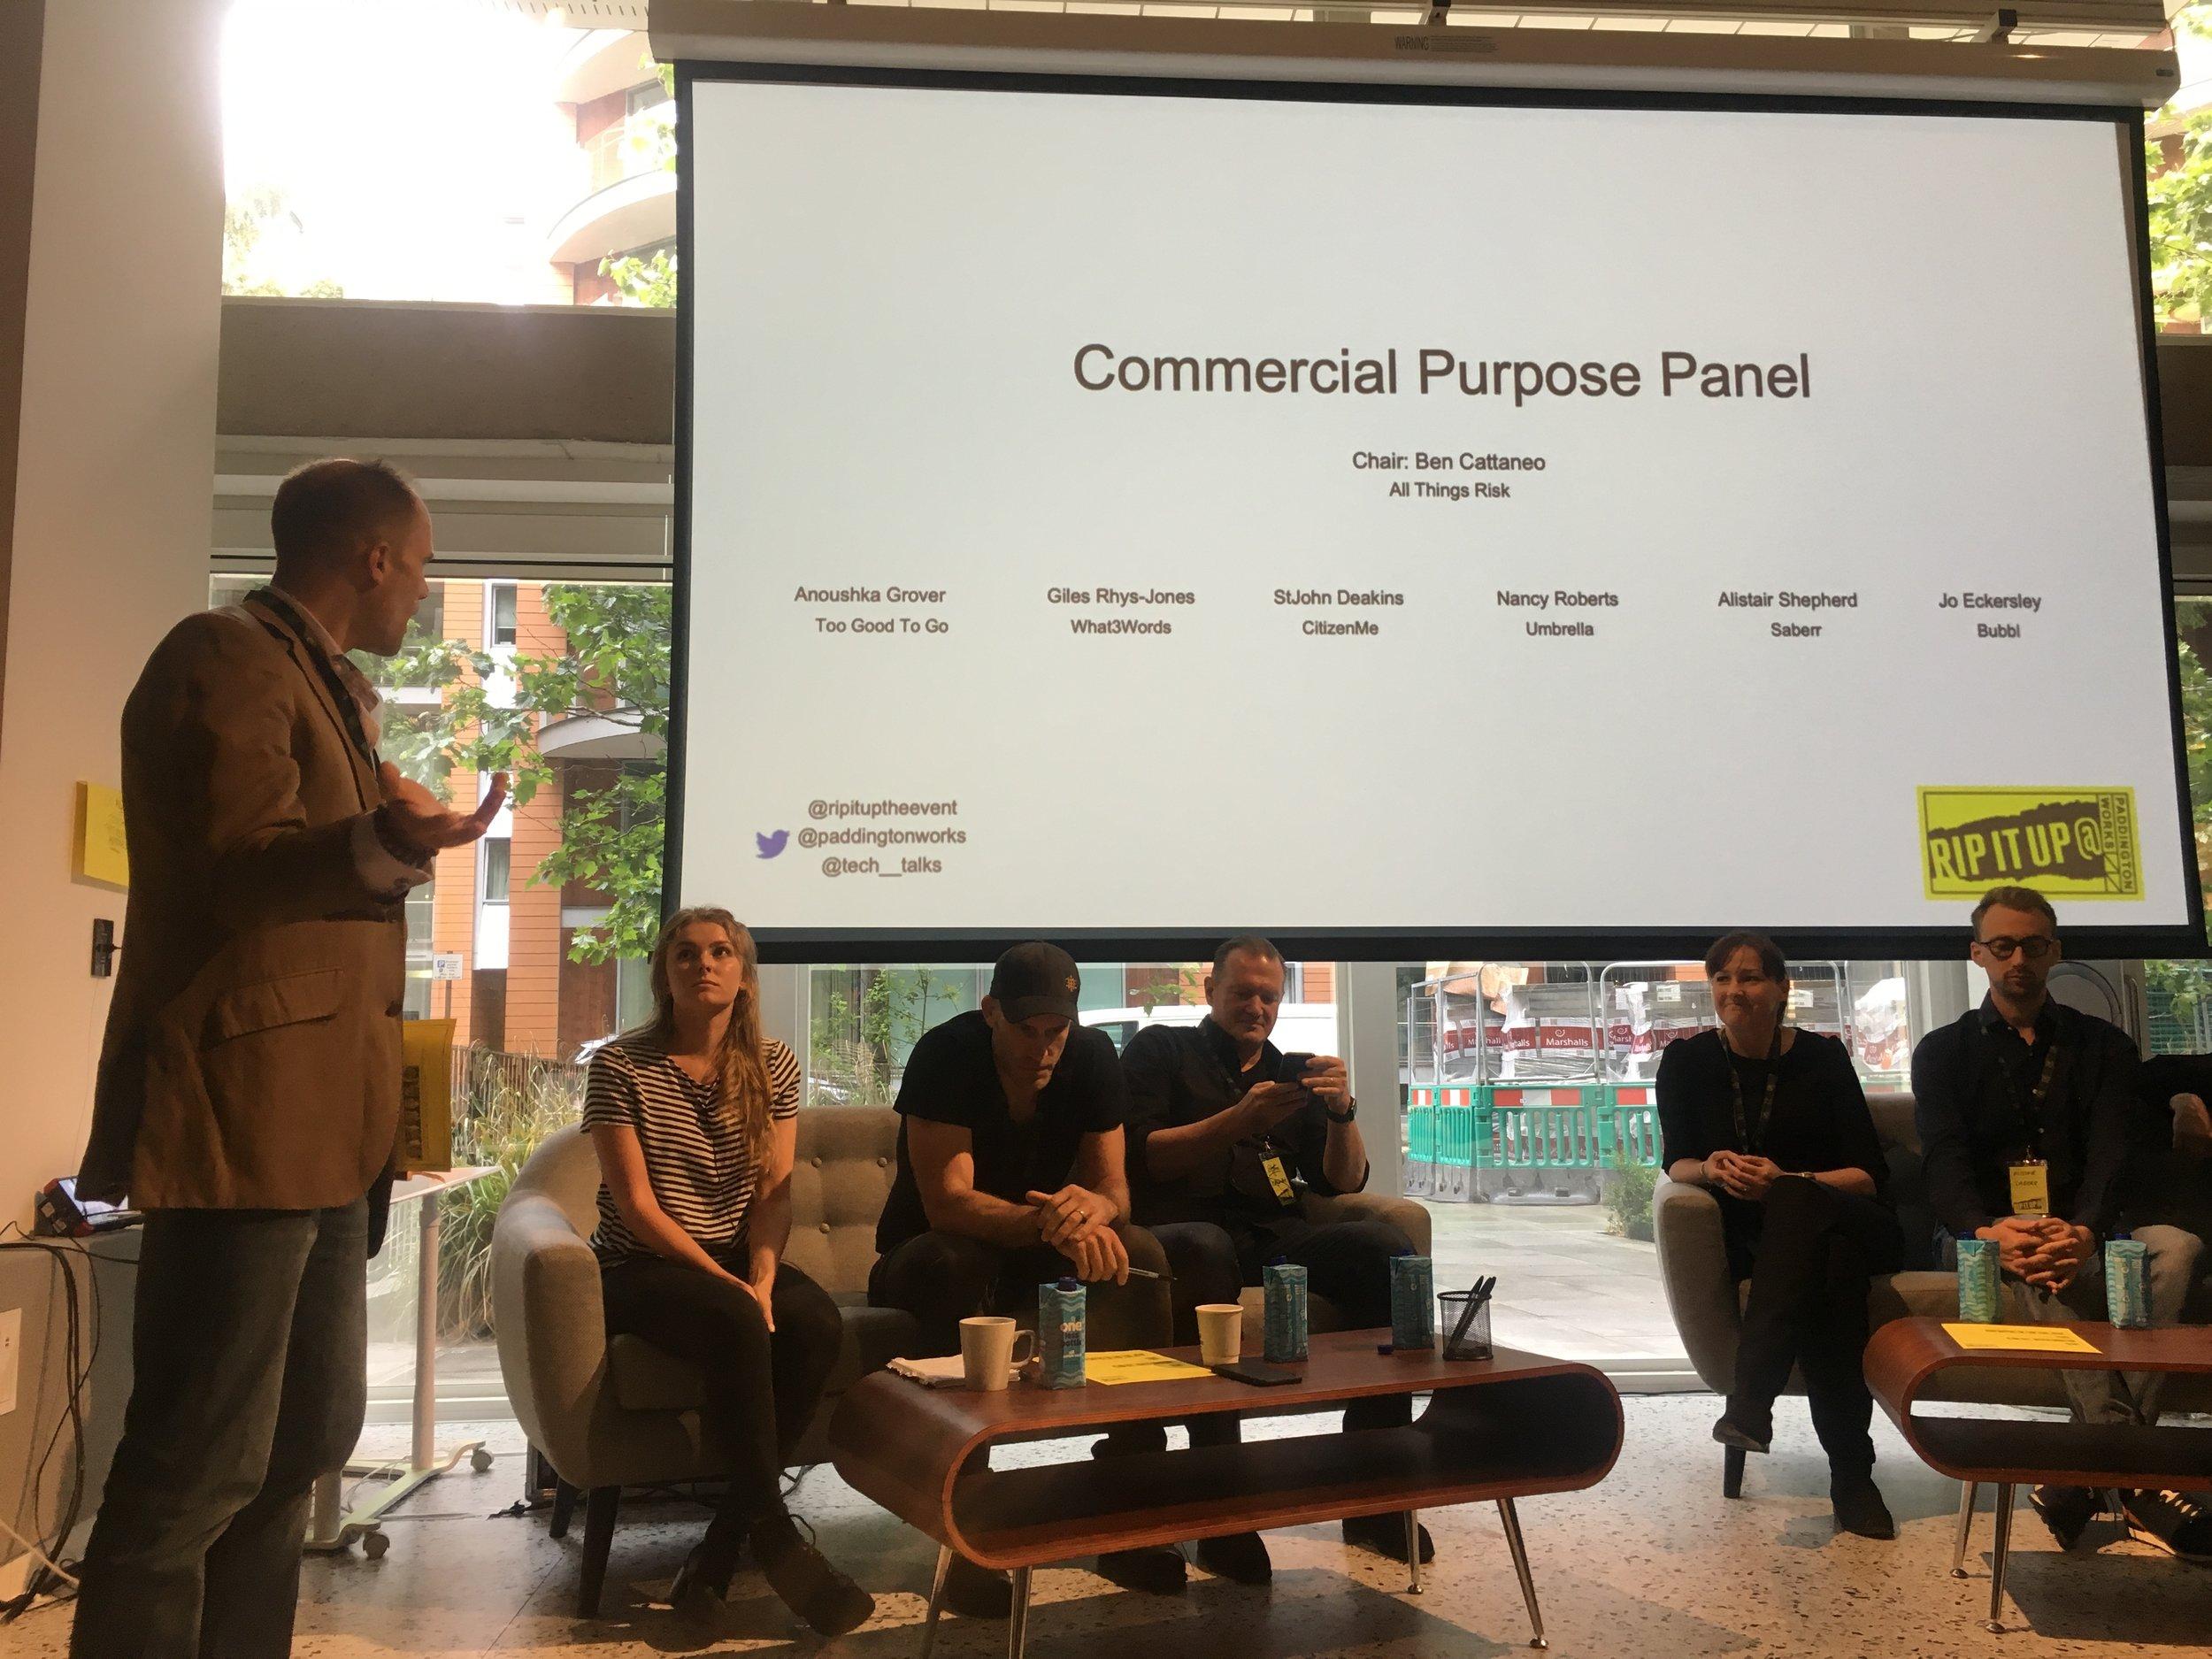 Commercial Purpose Panel.JPG